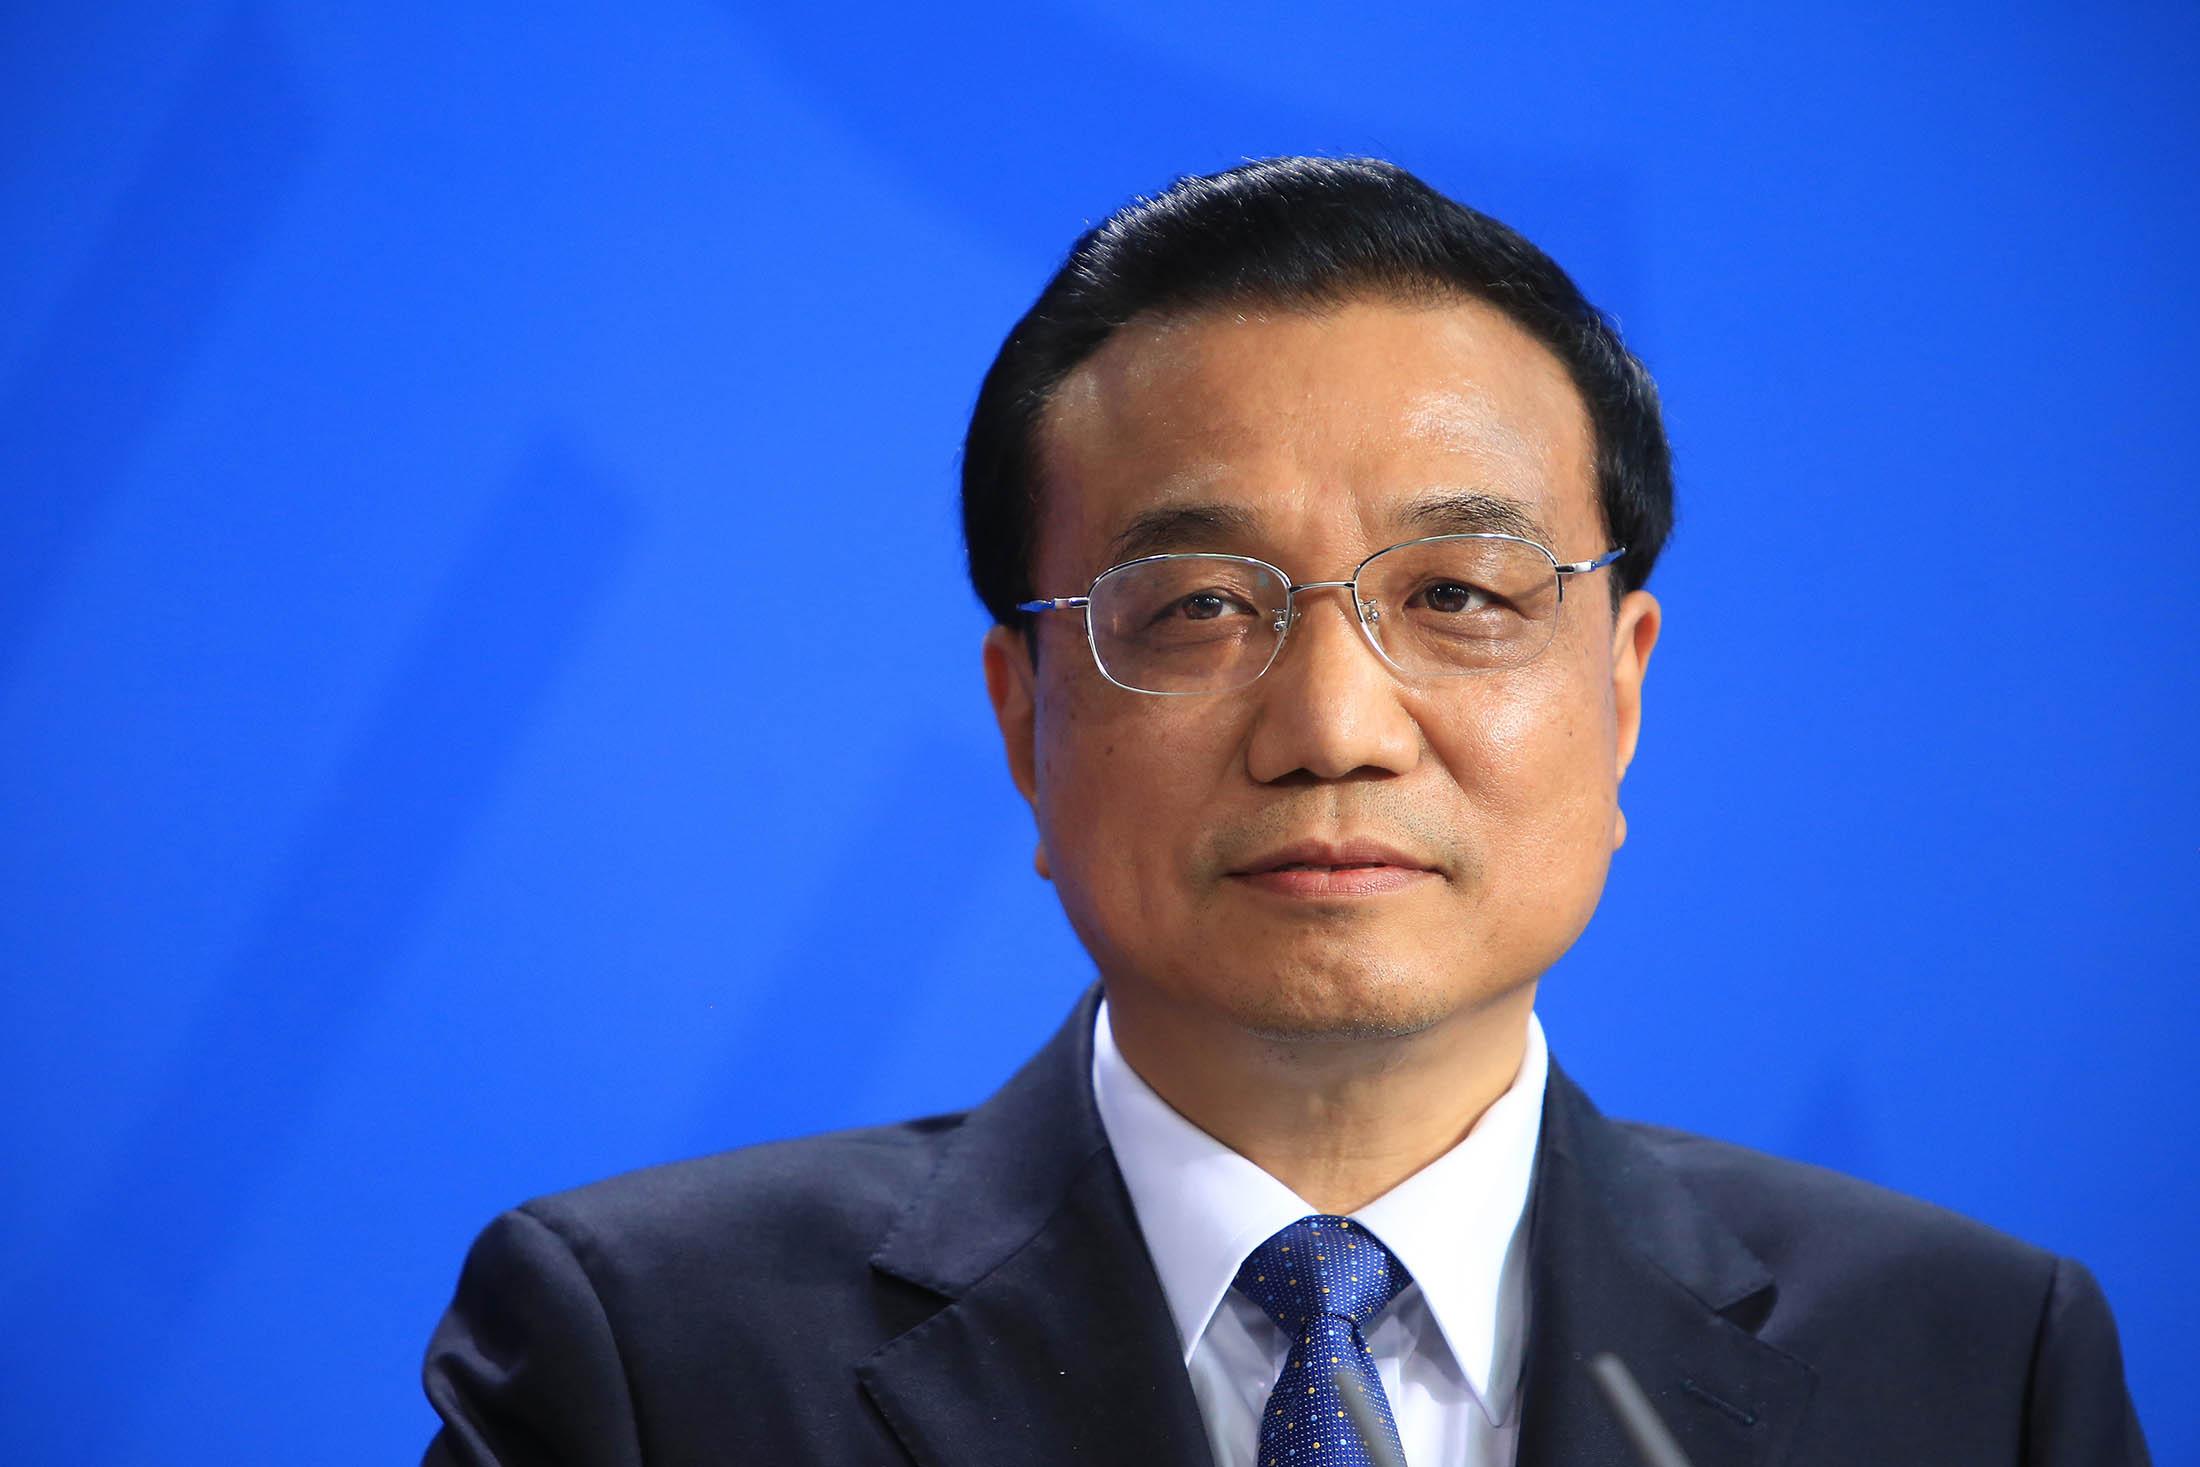 Primer ministro chino preside reunión ejecutiva de Consejo de Estado